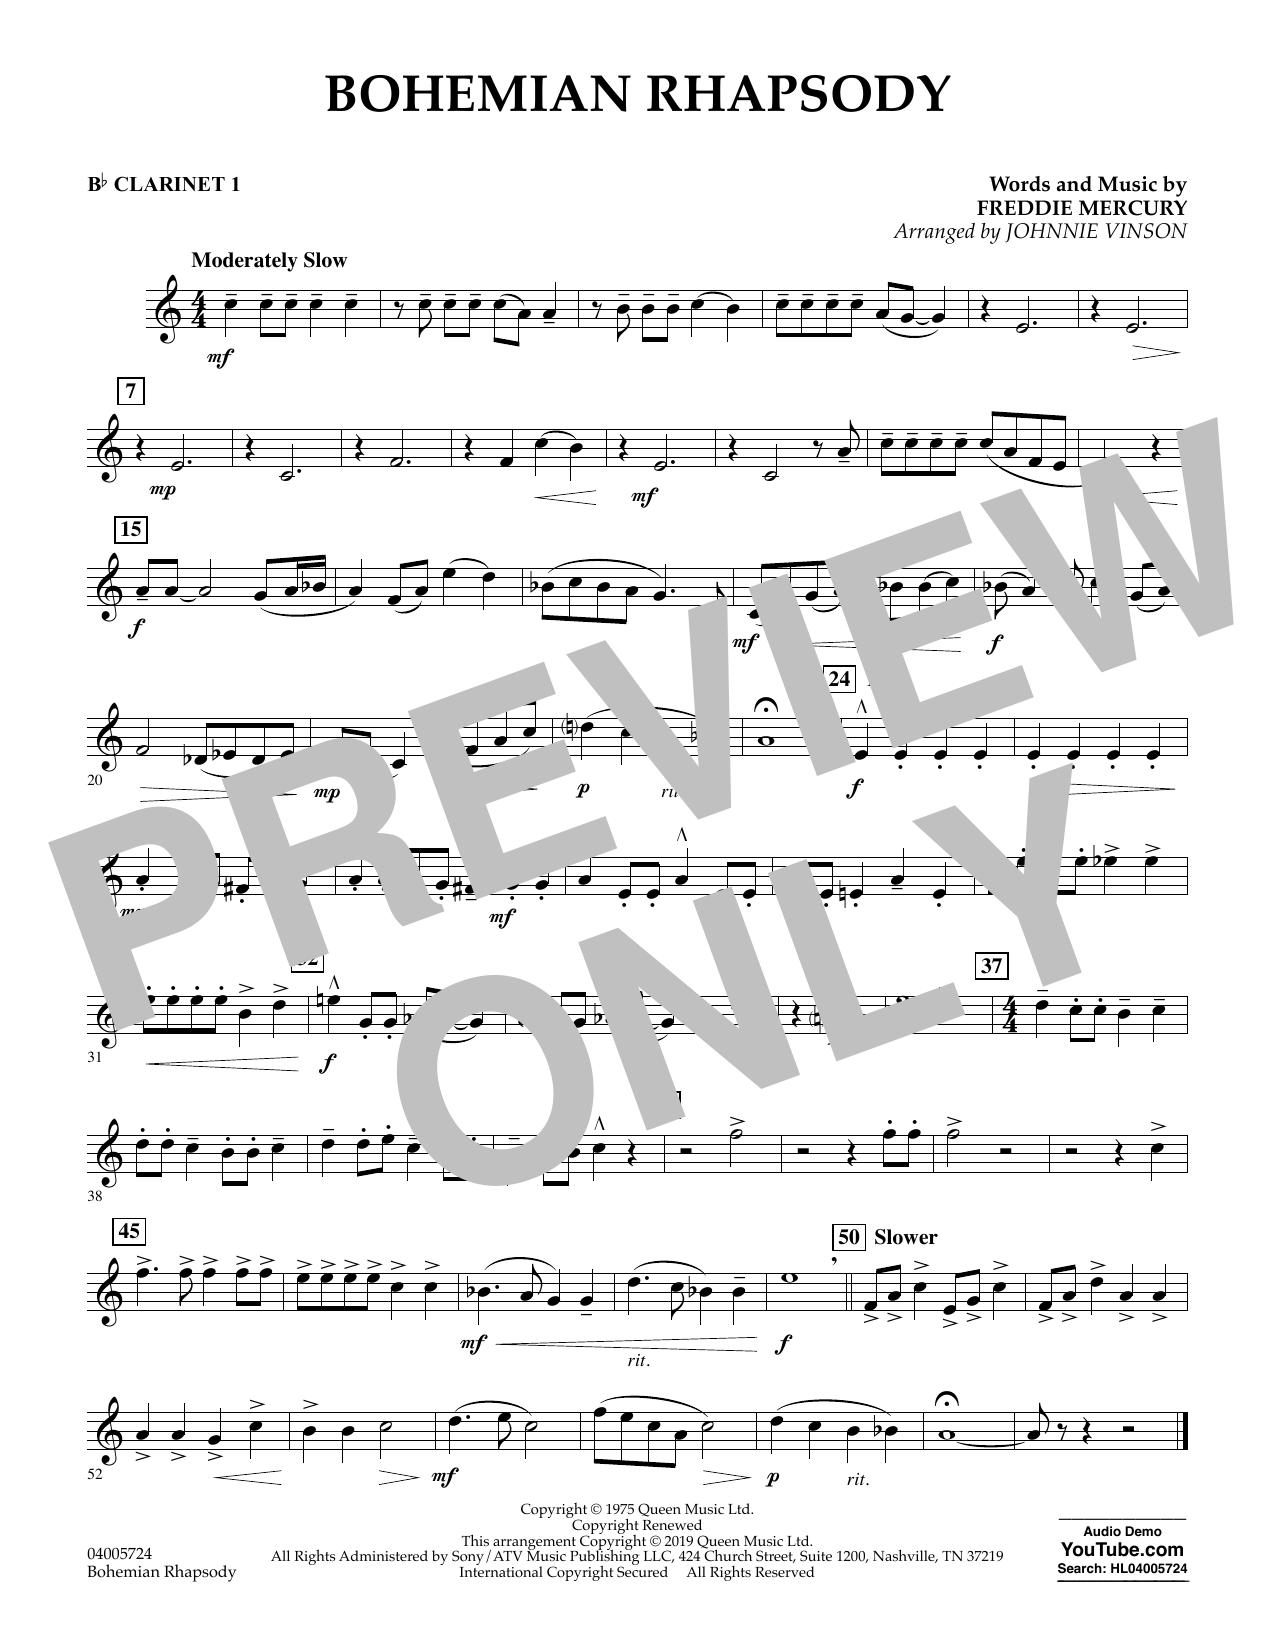 Bohemian Rhapsody (arr. Johnnie Vinson) - Bb Clarinet 1 (Concert Band)